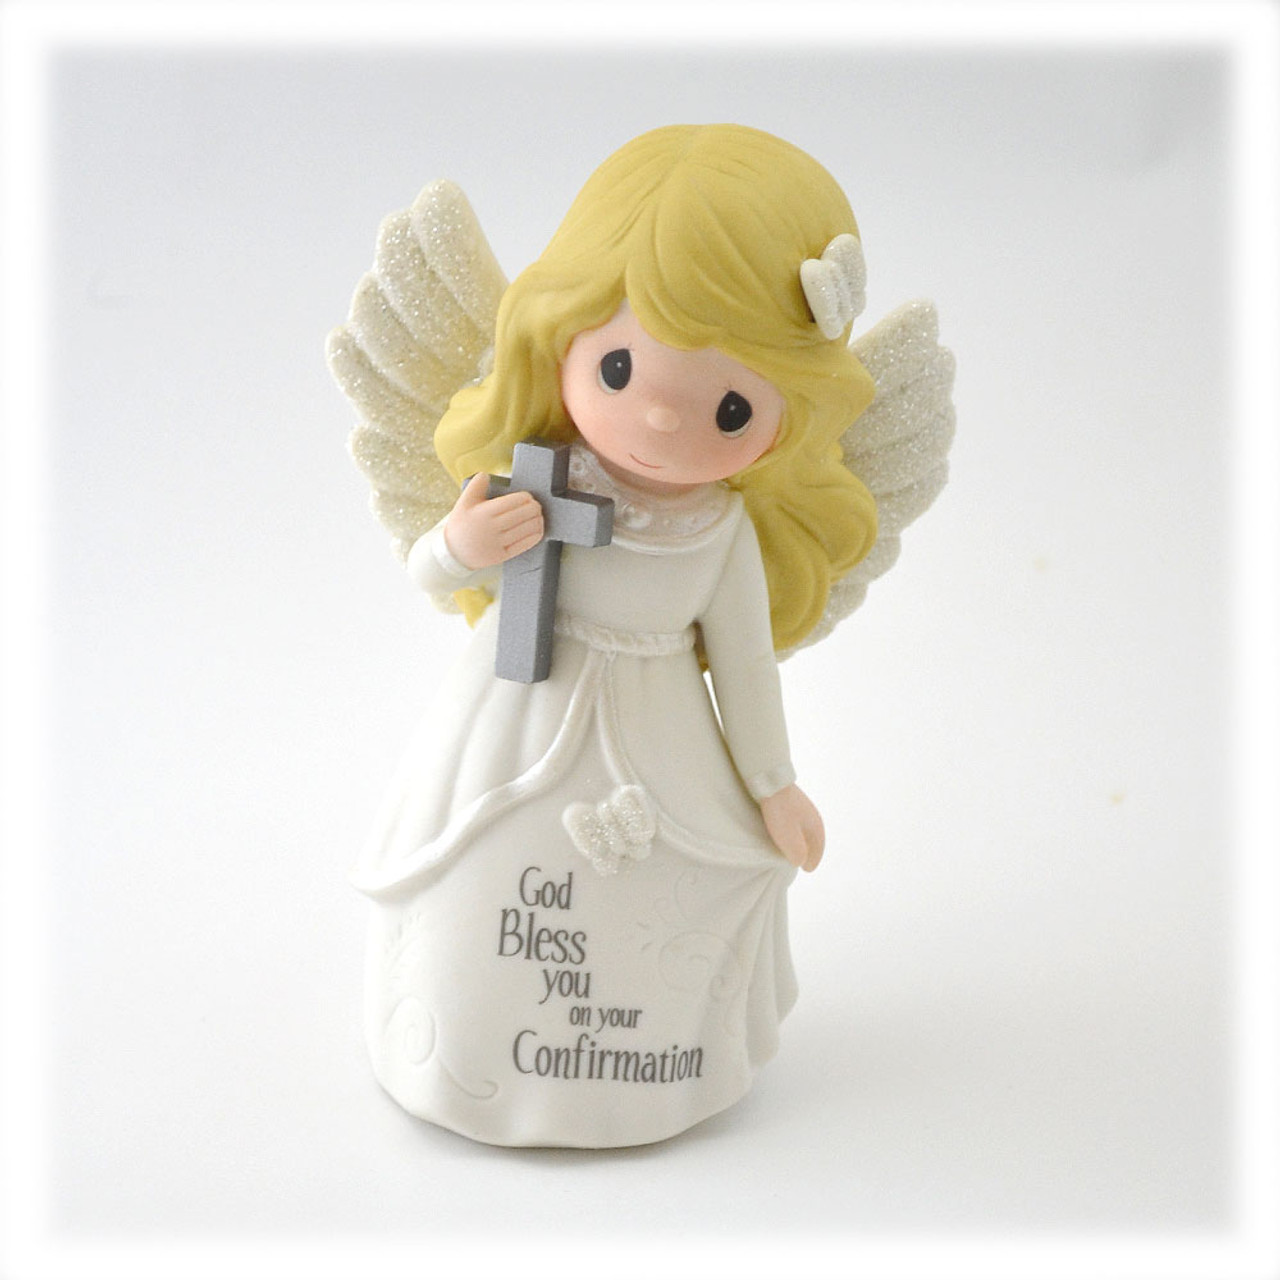 Precious Moments Confirmation Angel Statue